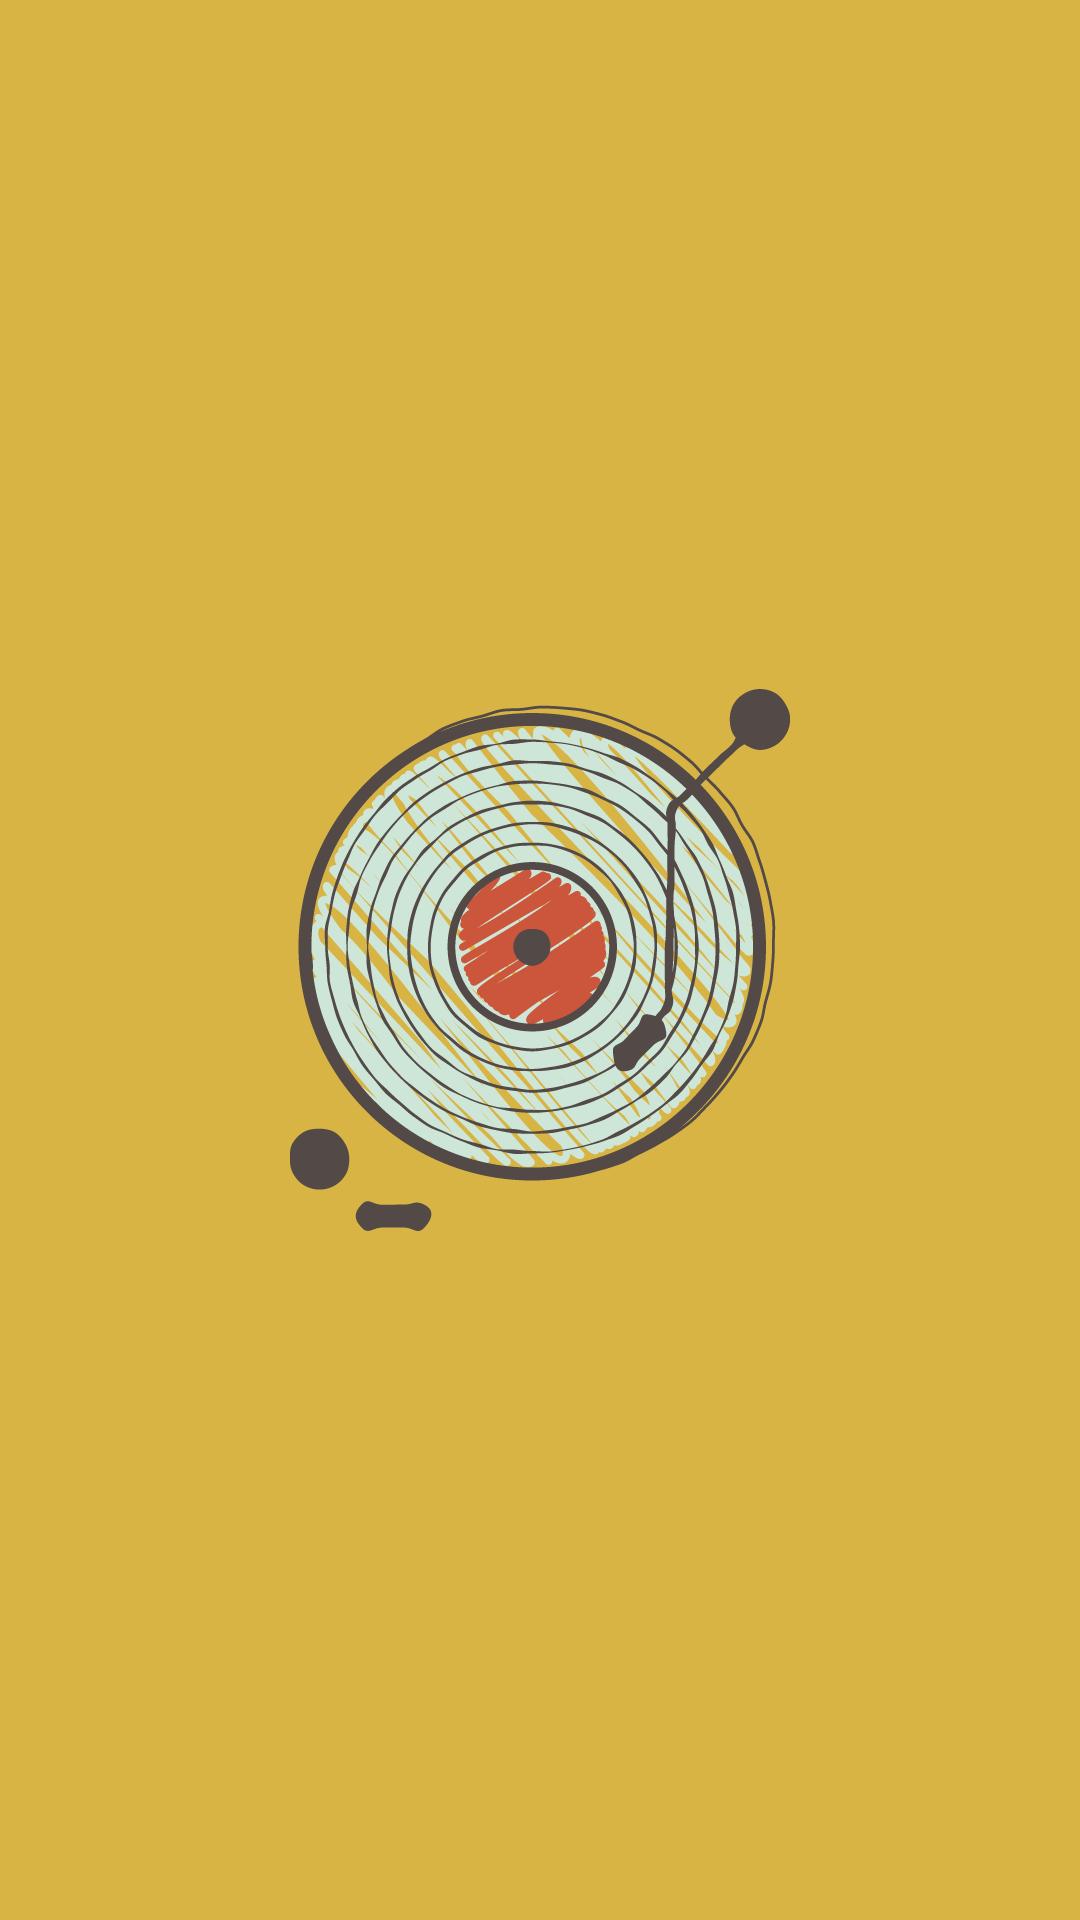 Record Player Icon Objek gambar, Seni grafis, Pengeditan